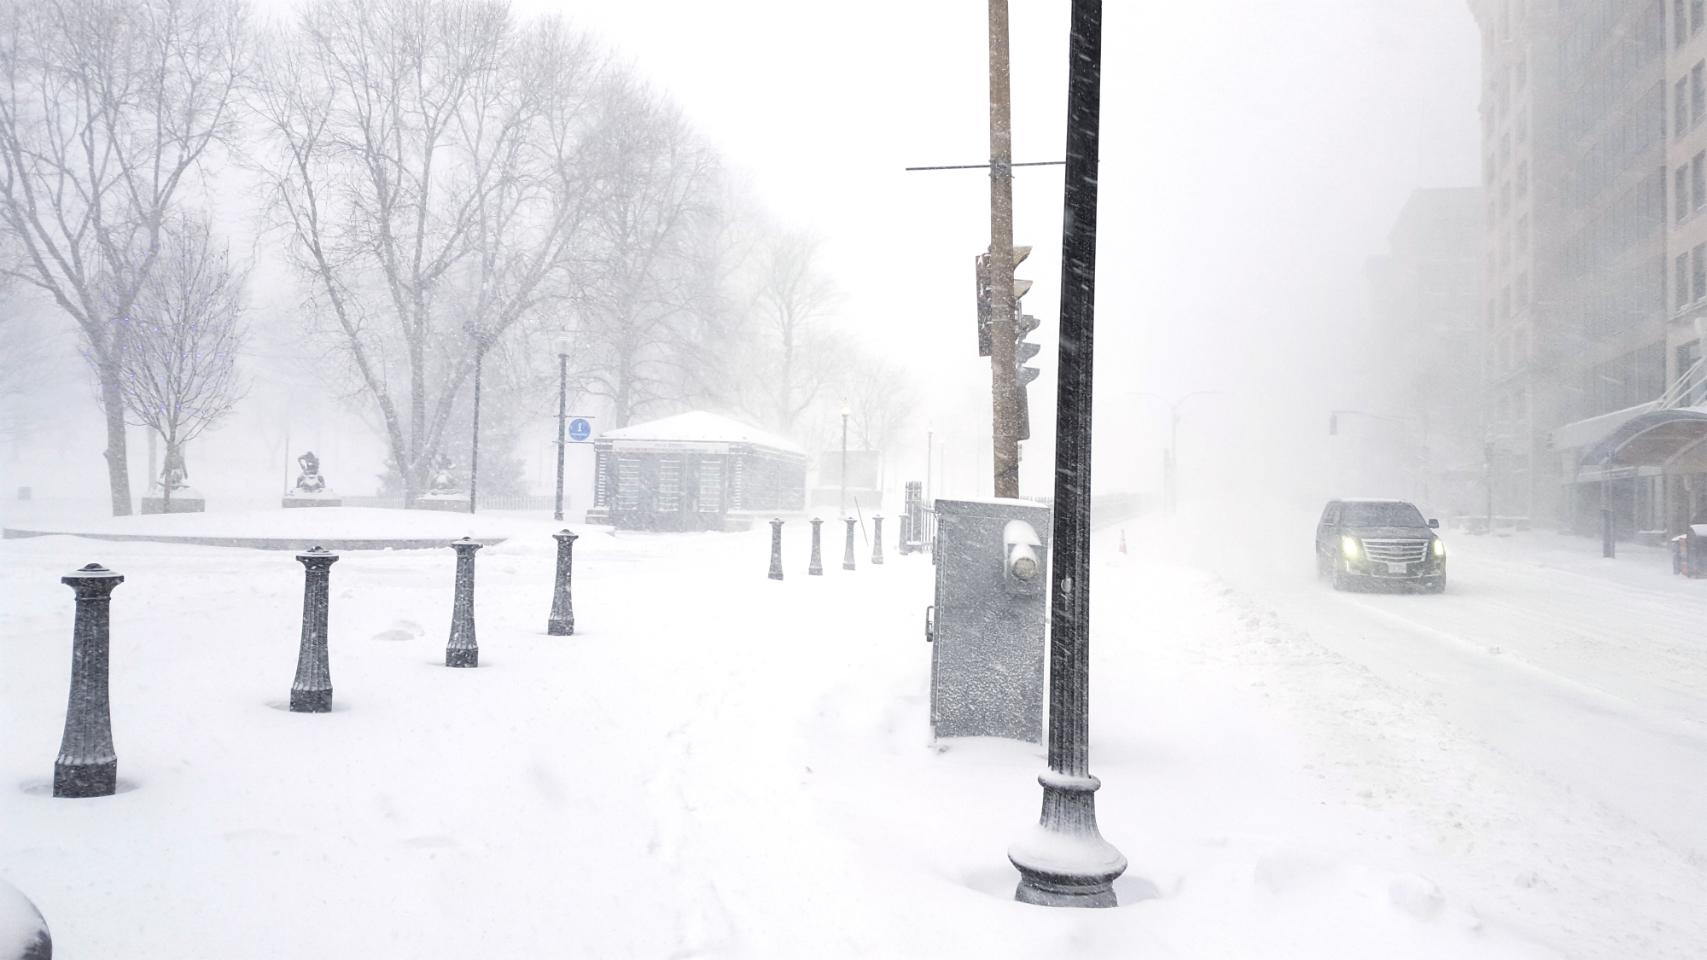 park-street-snow-sidewalk.jpg